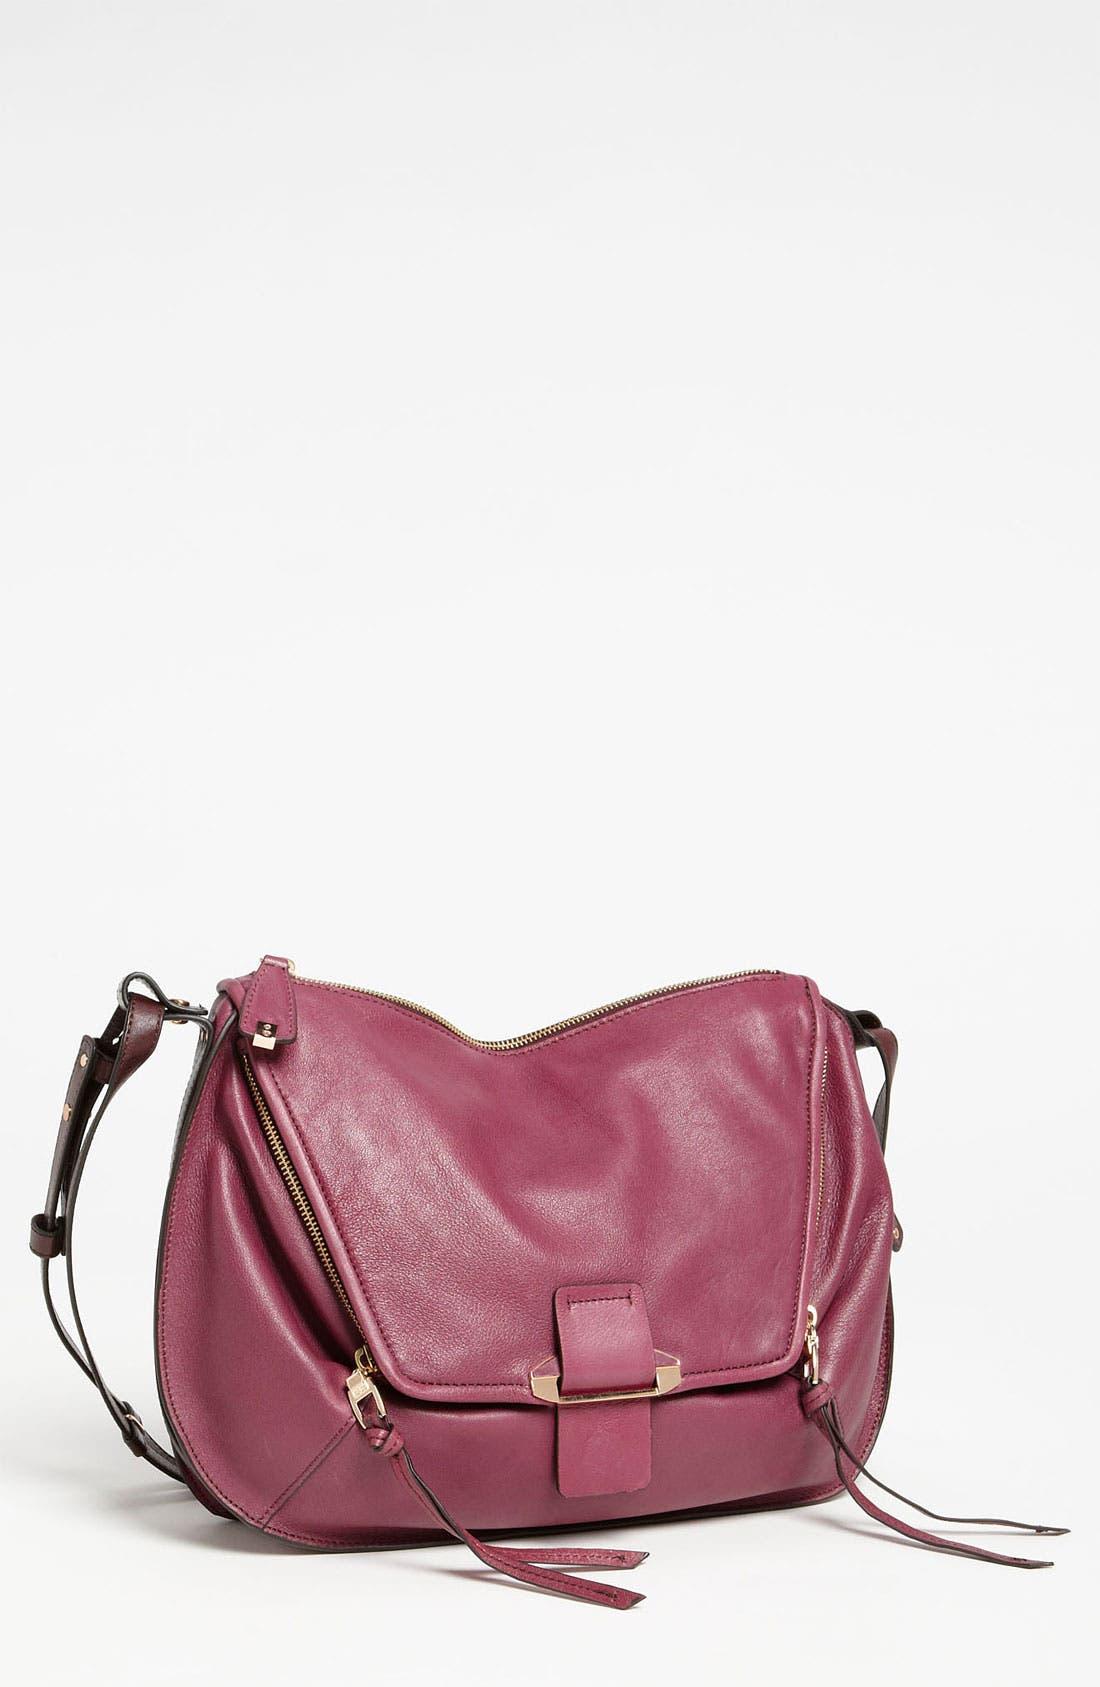 Alternate Image 1 Selected - Kooba 'Leroy' Crossbody Bag